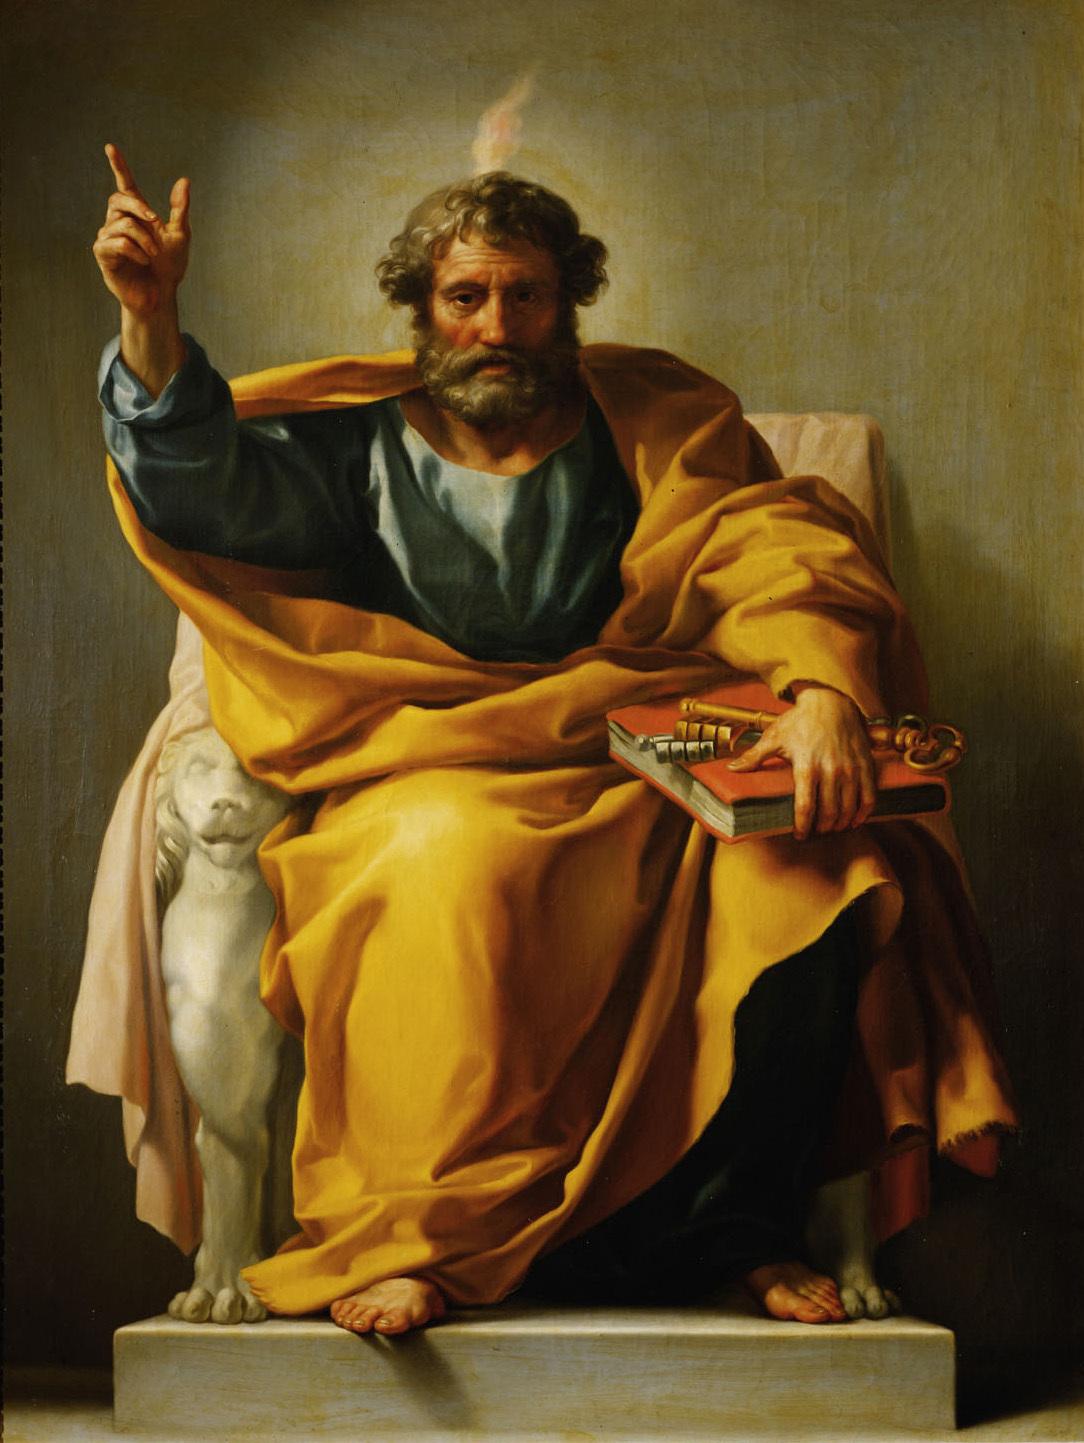 Apostel krebten Datierung an